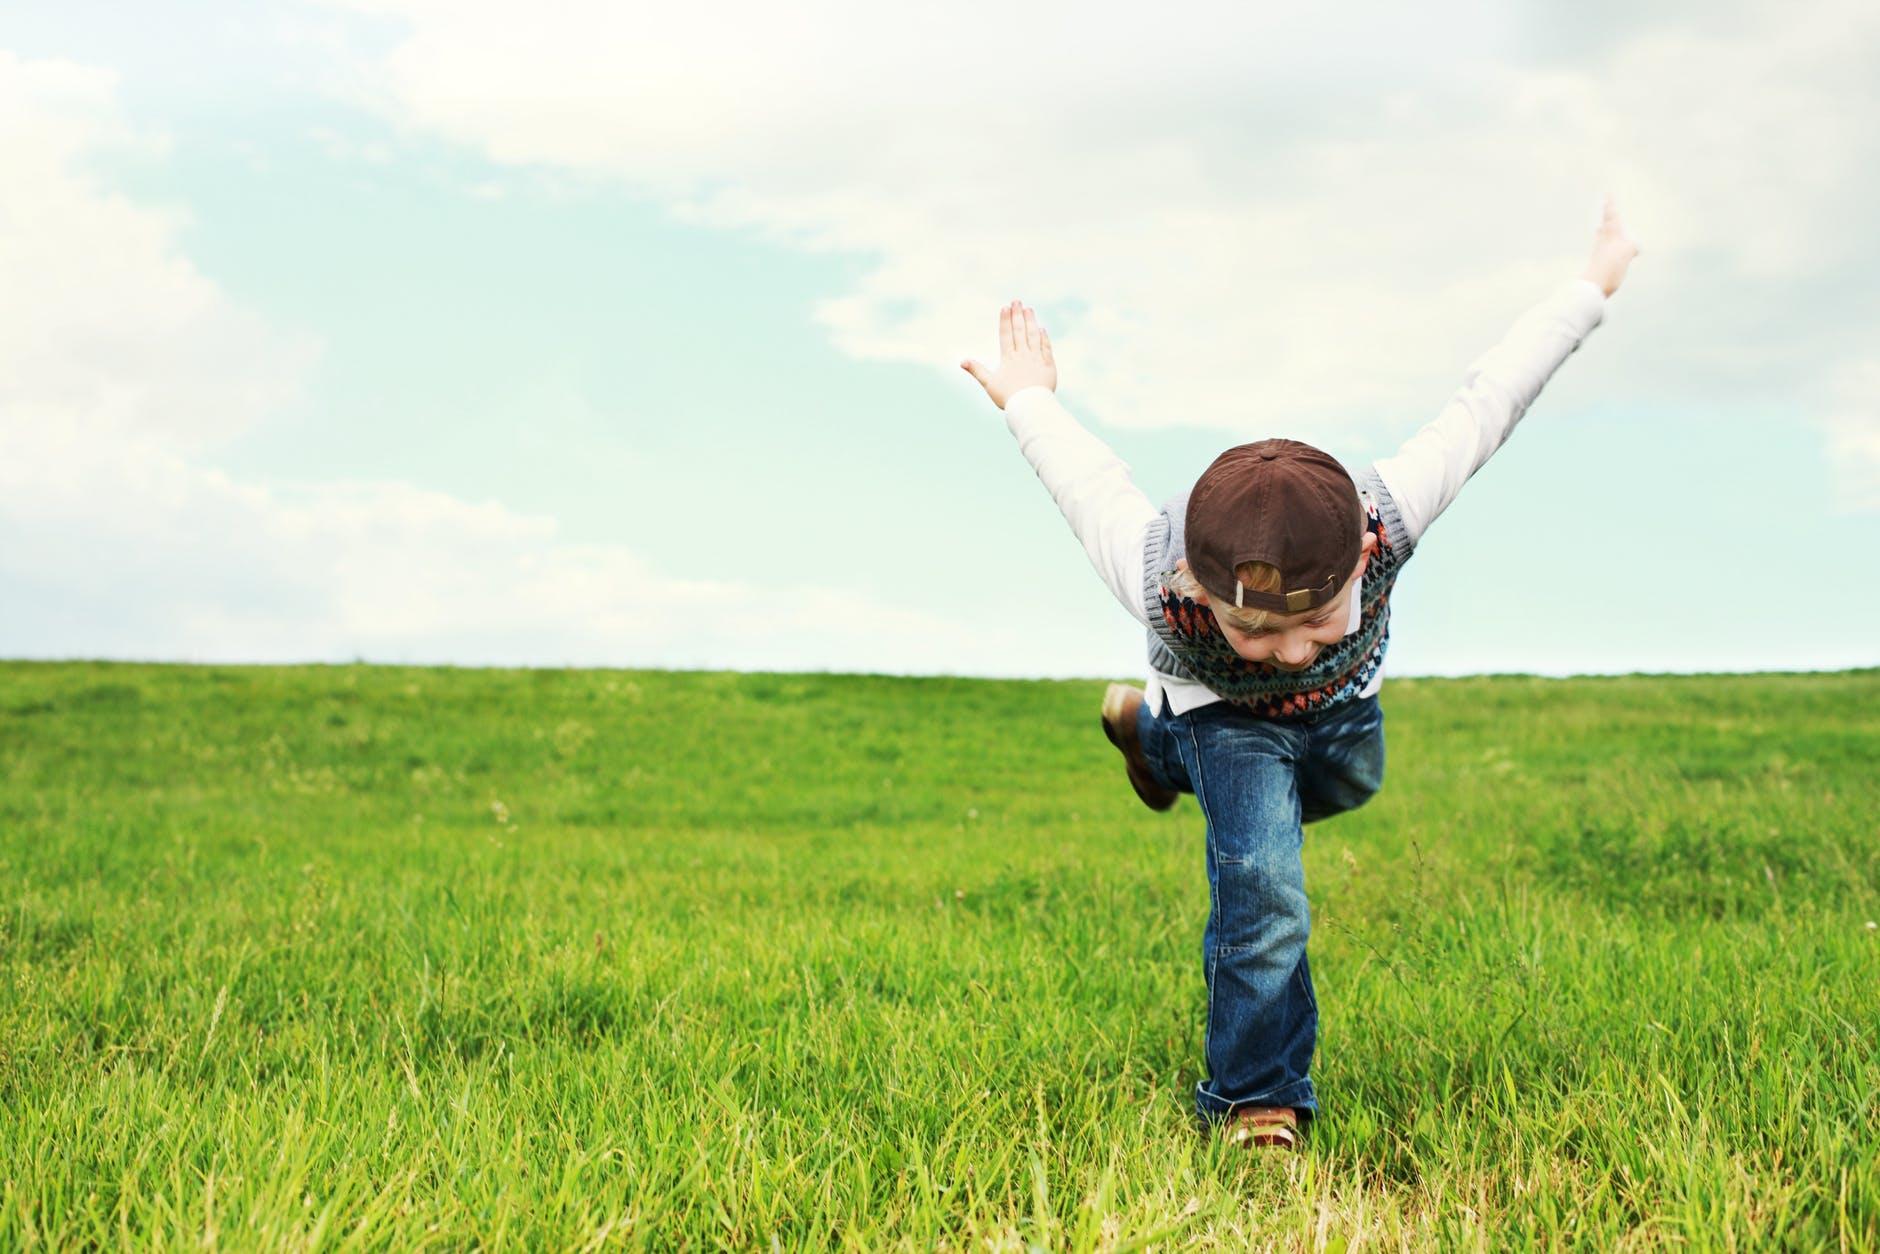 niño saltando, granja escuela albitana